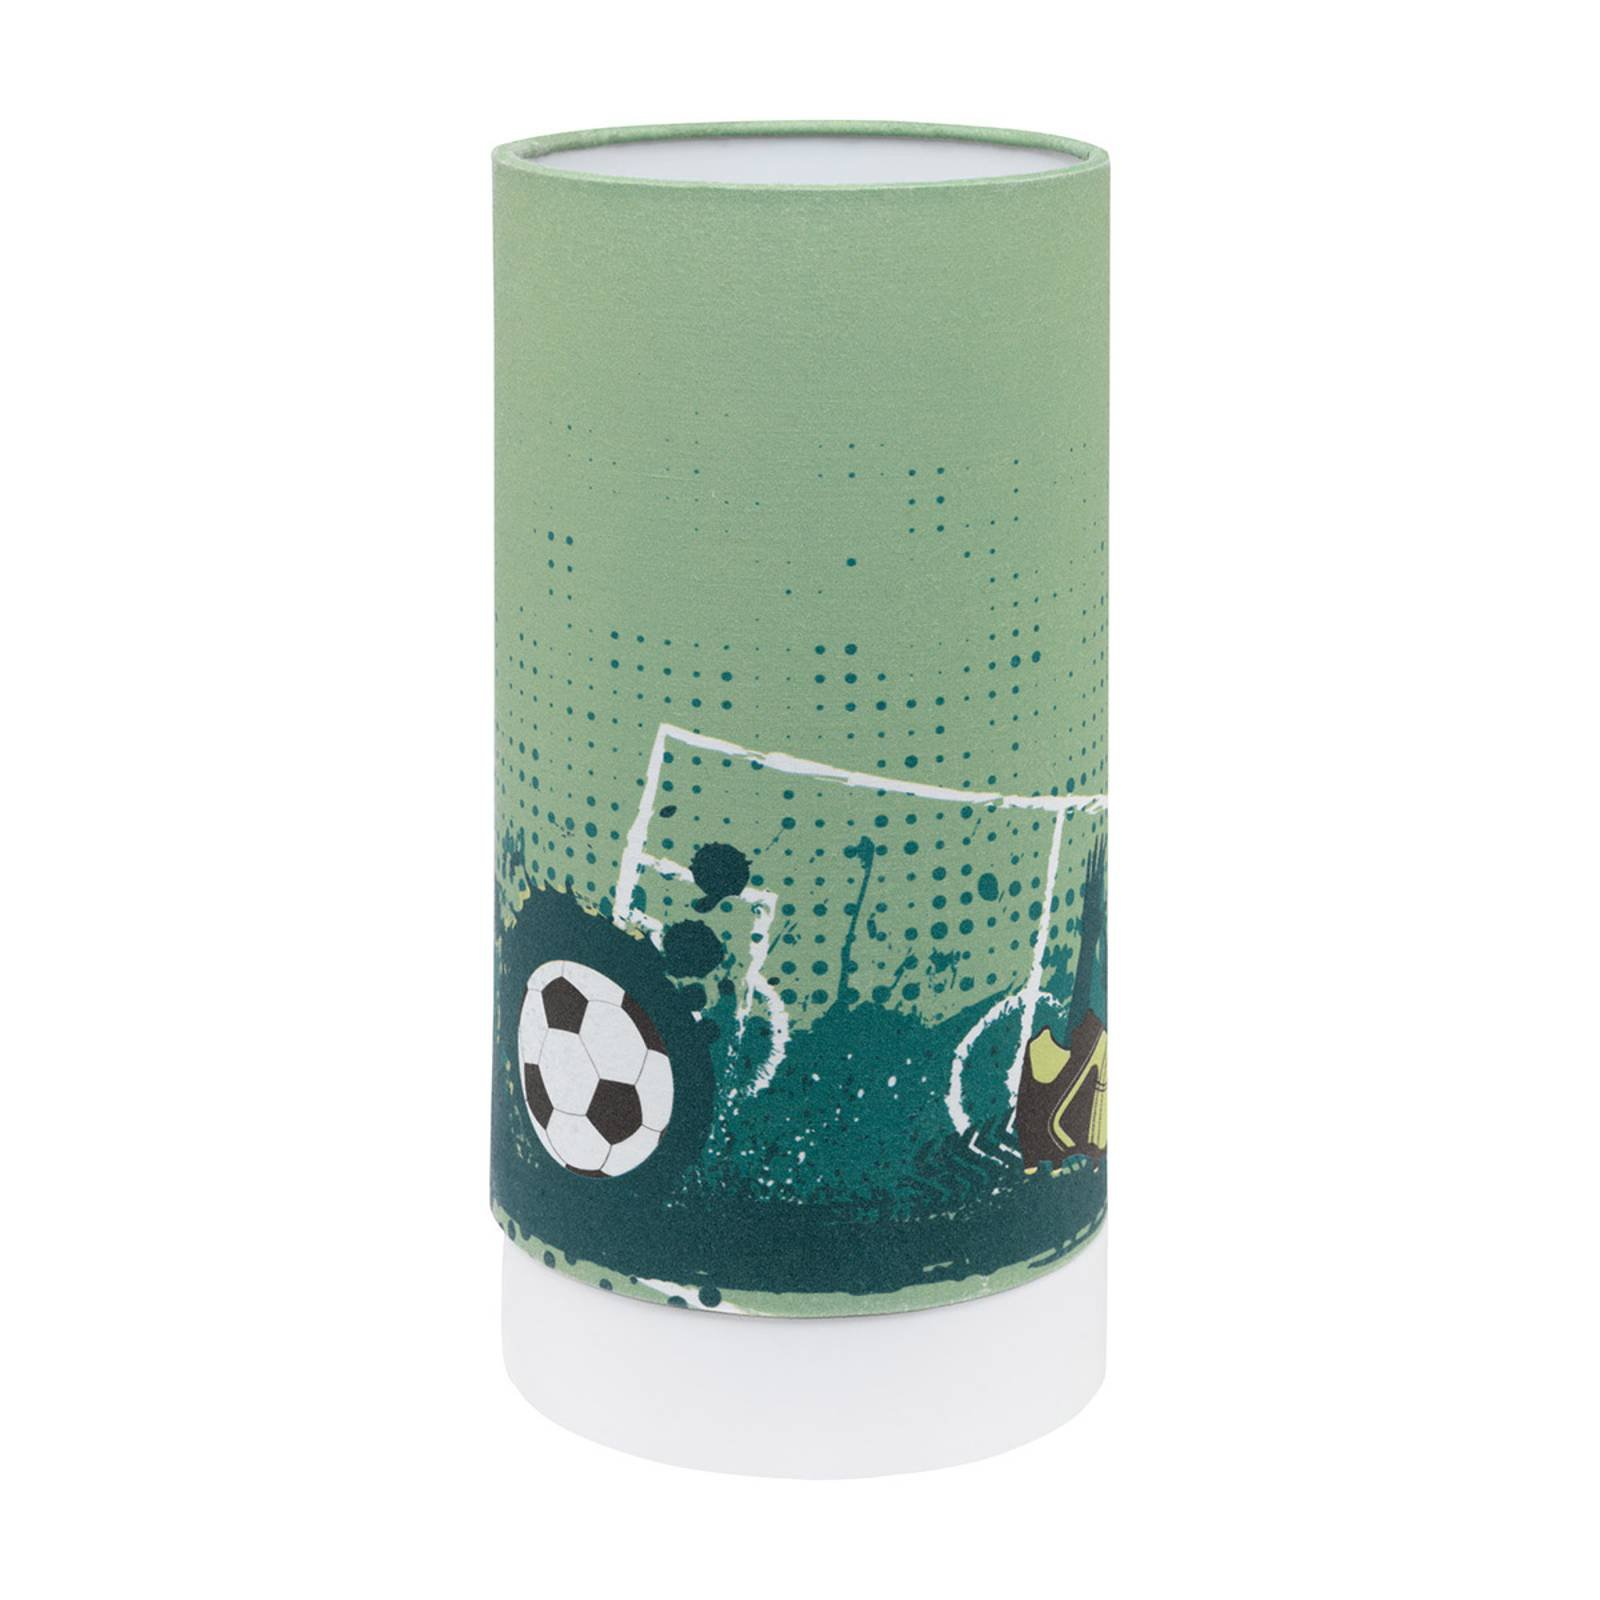 LED-bordlampe Tabara med fotballmotiv